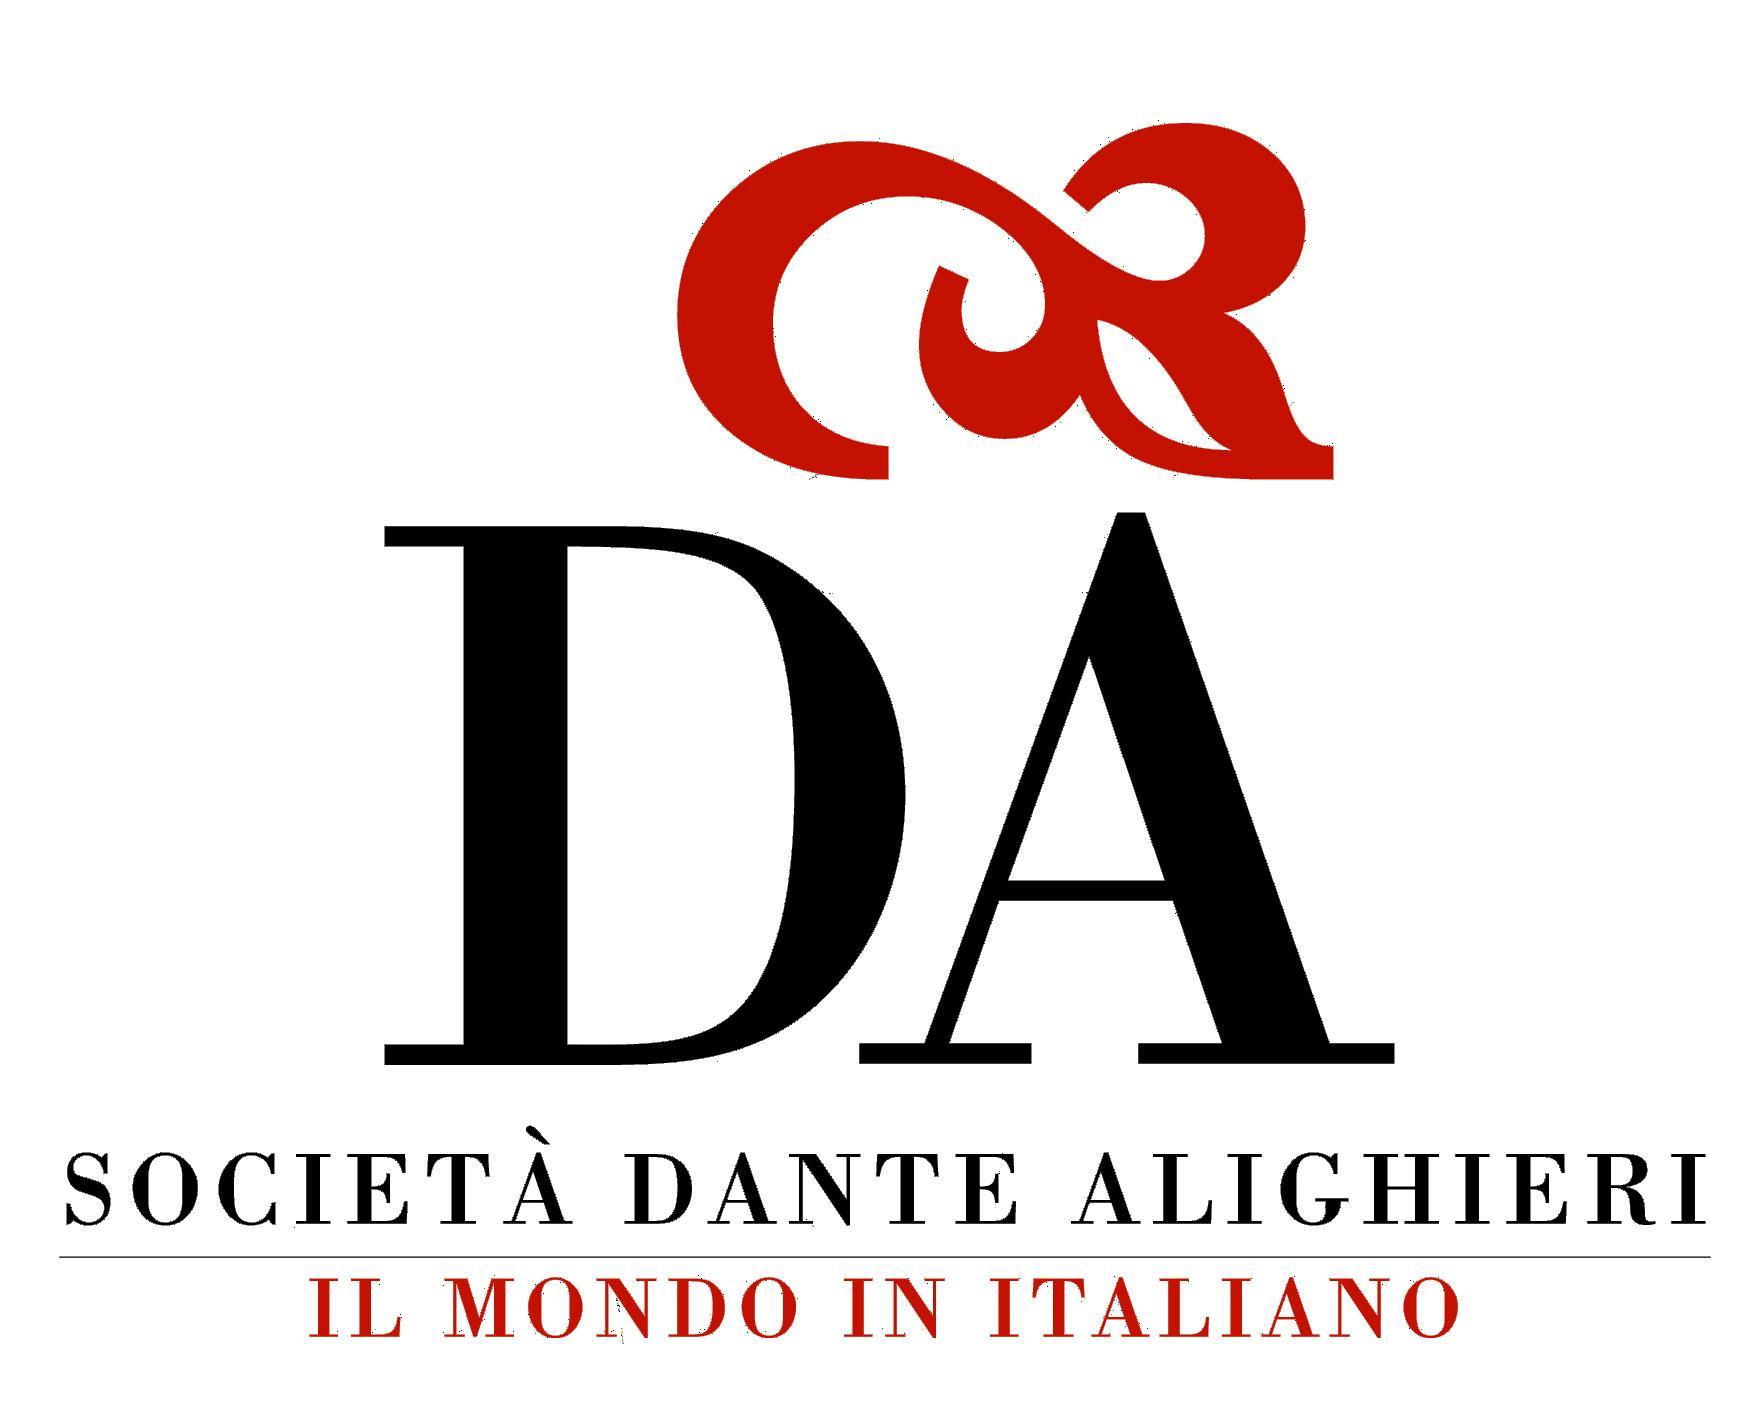 Общество Данте Алигьери